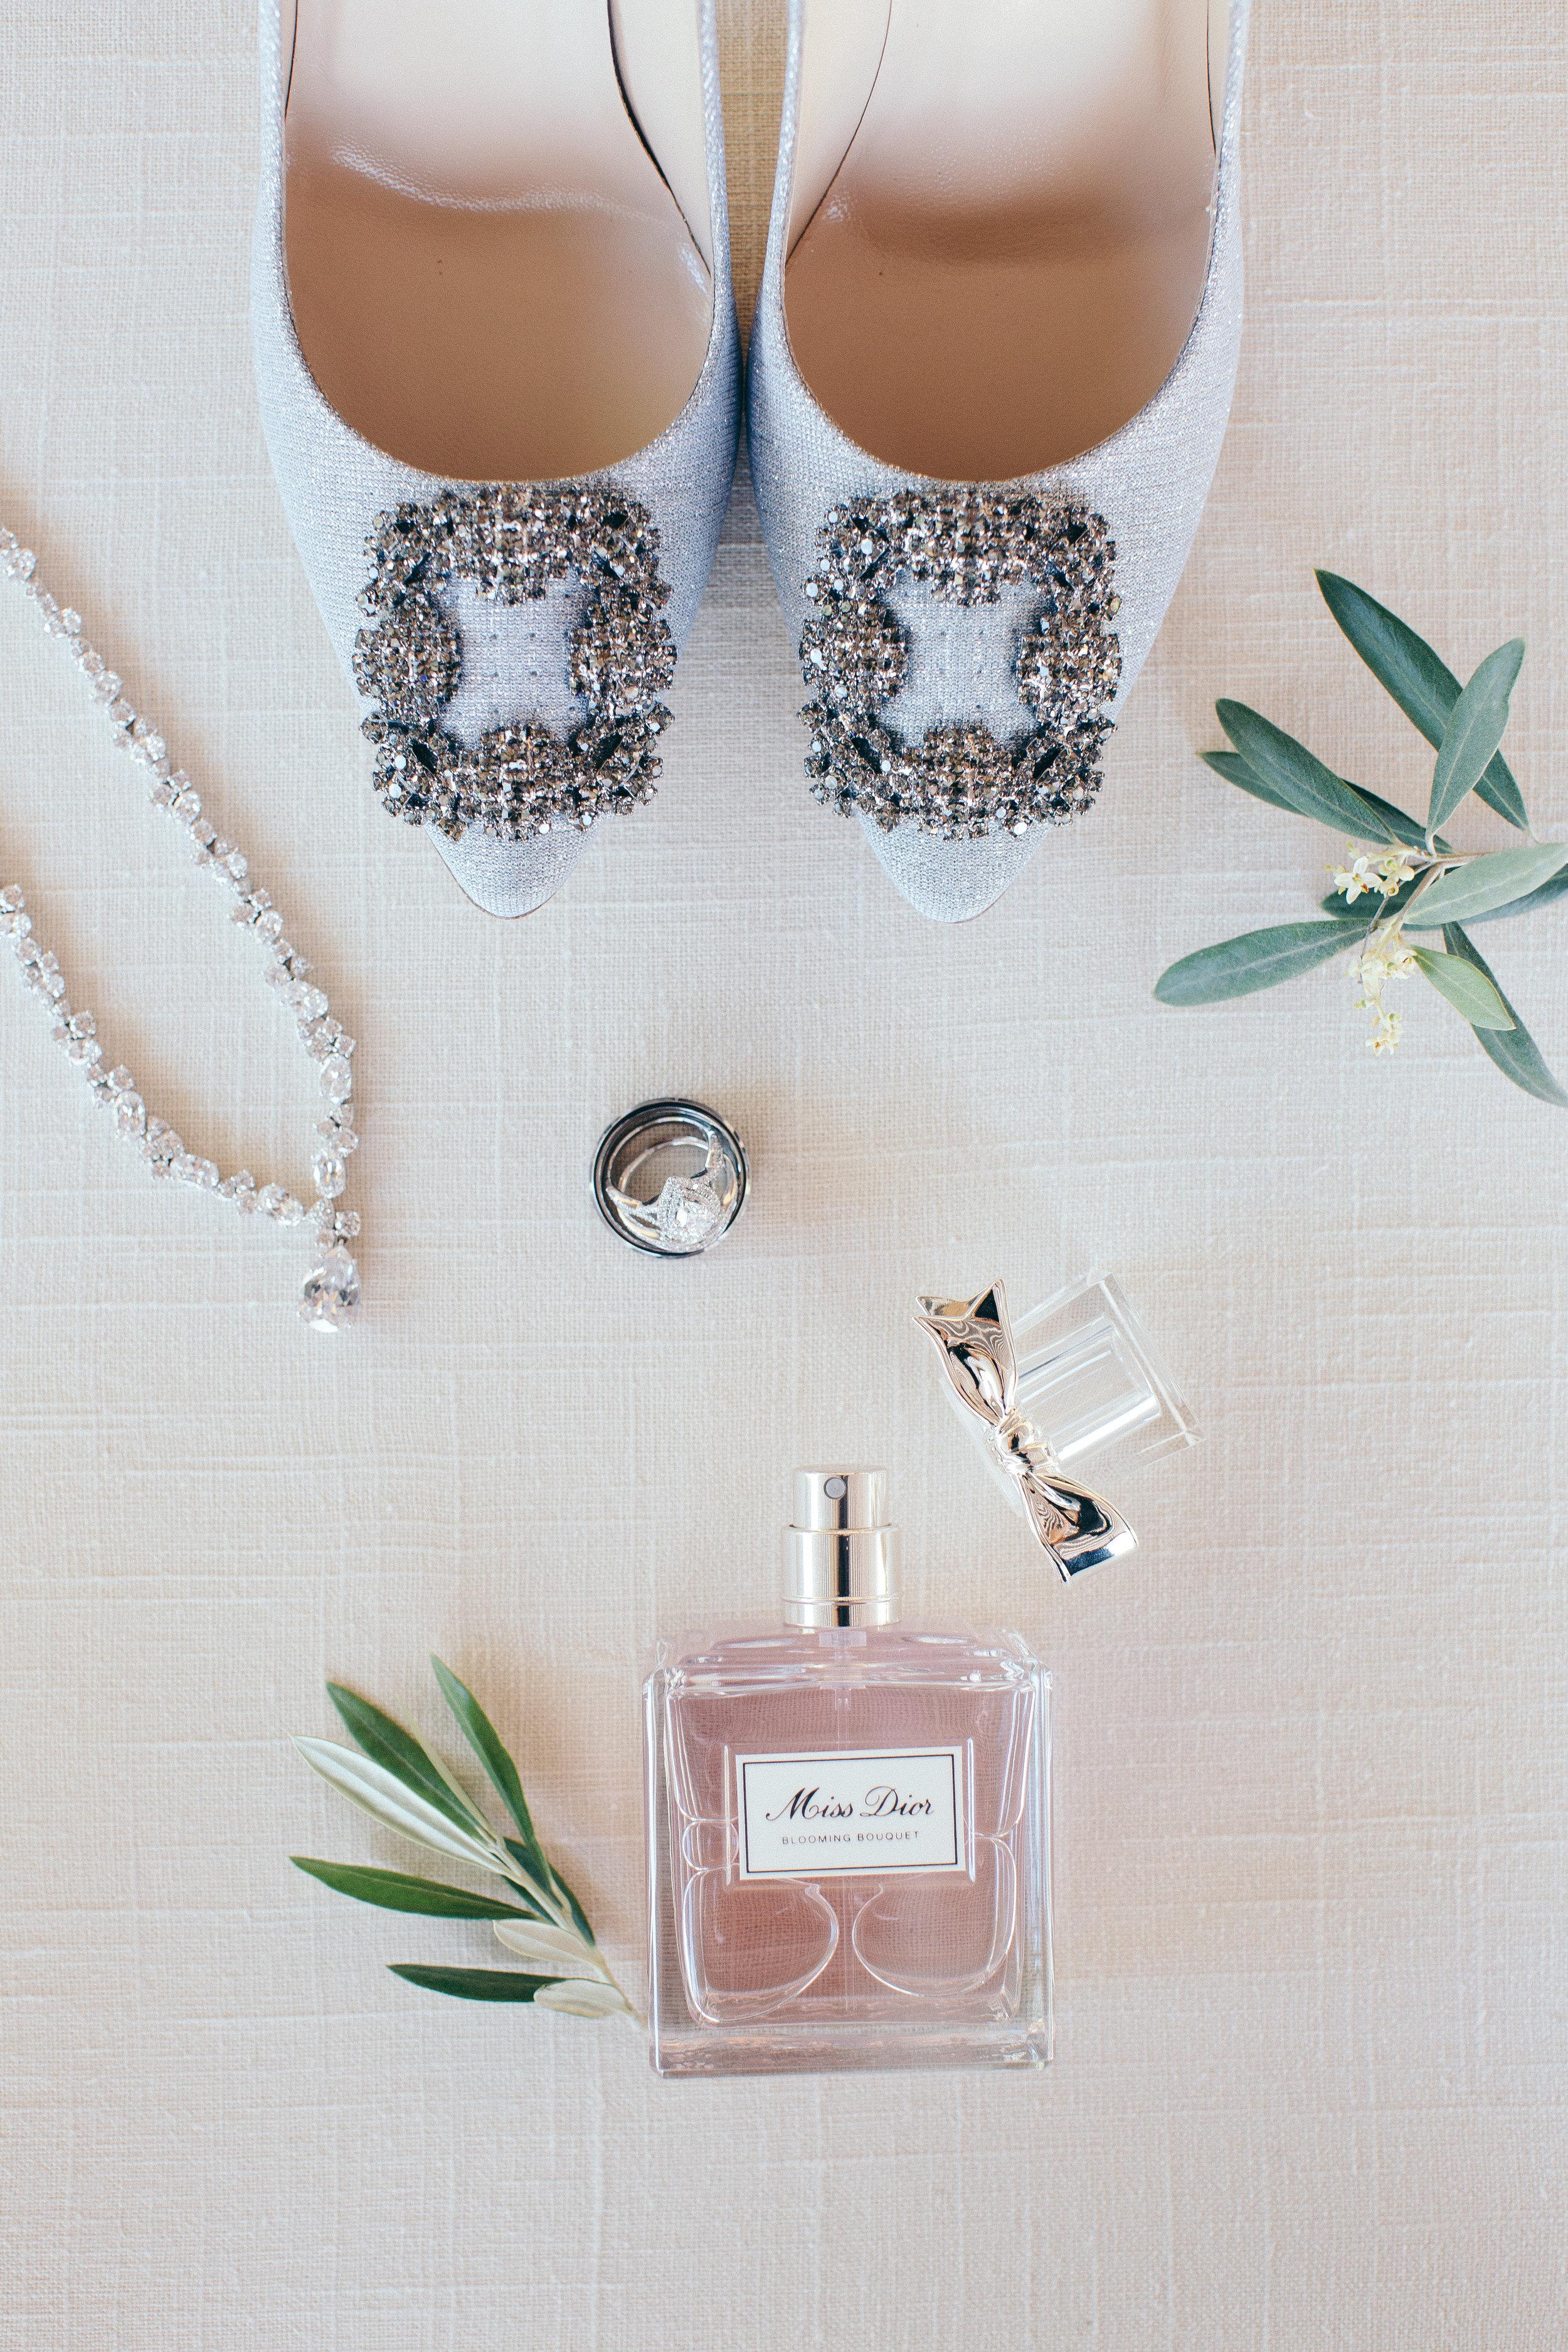 Violette-fleurs-anna-perevertaylo-White-Blush-elegant-flowers-for-wedding-decor-upscale-design-roseville-sacramento-california-rancho-robles-vinyards-lincoln-elegant-luxury-details-perfume-blush.jpg